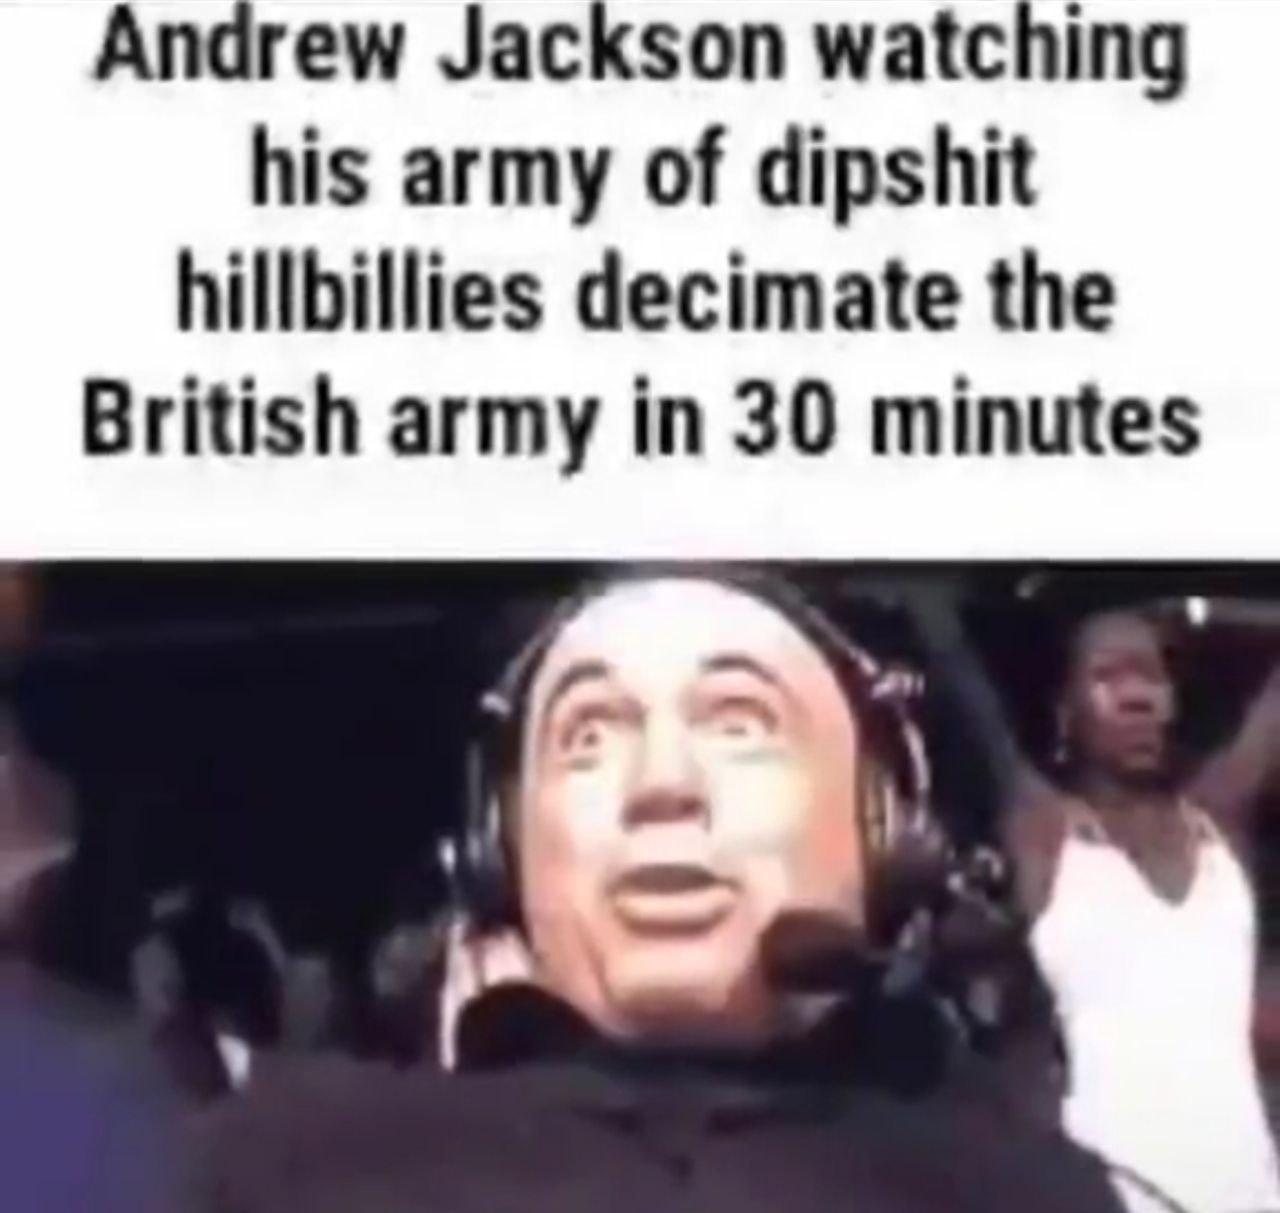 Andrew Jackson - American Sniper - meme